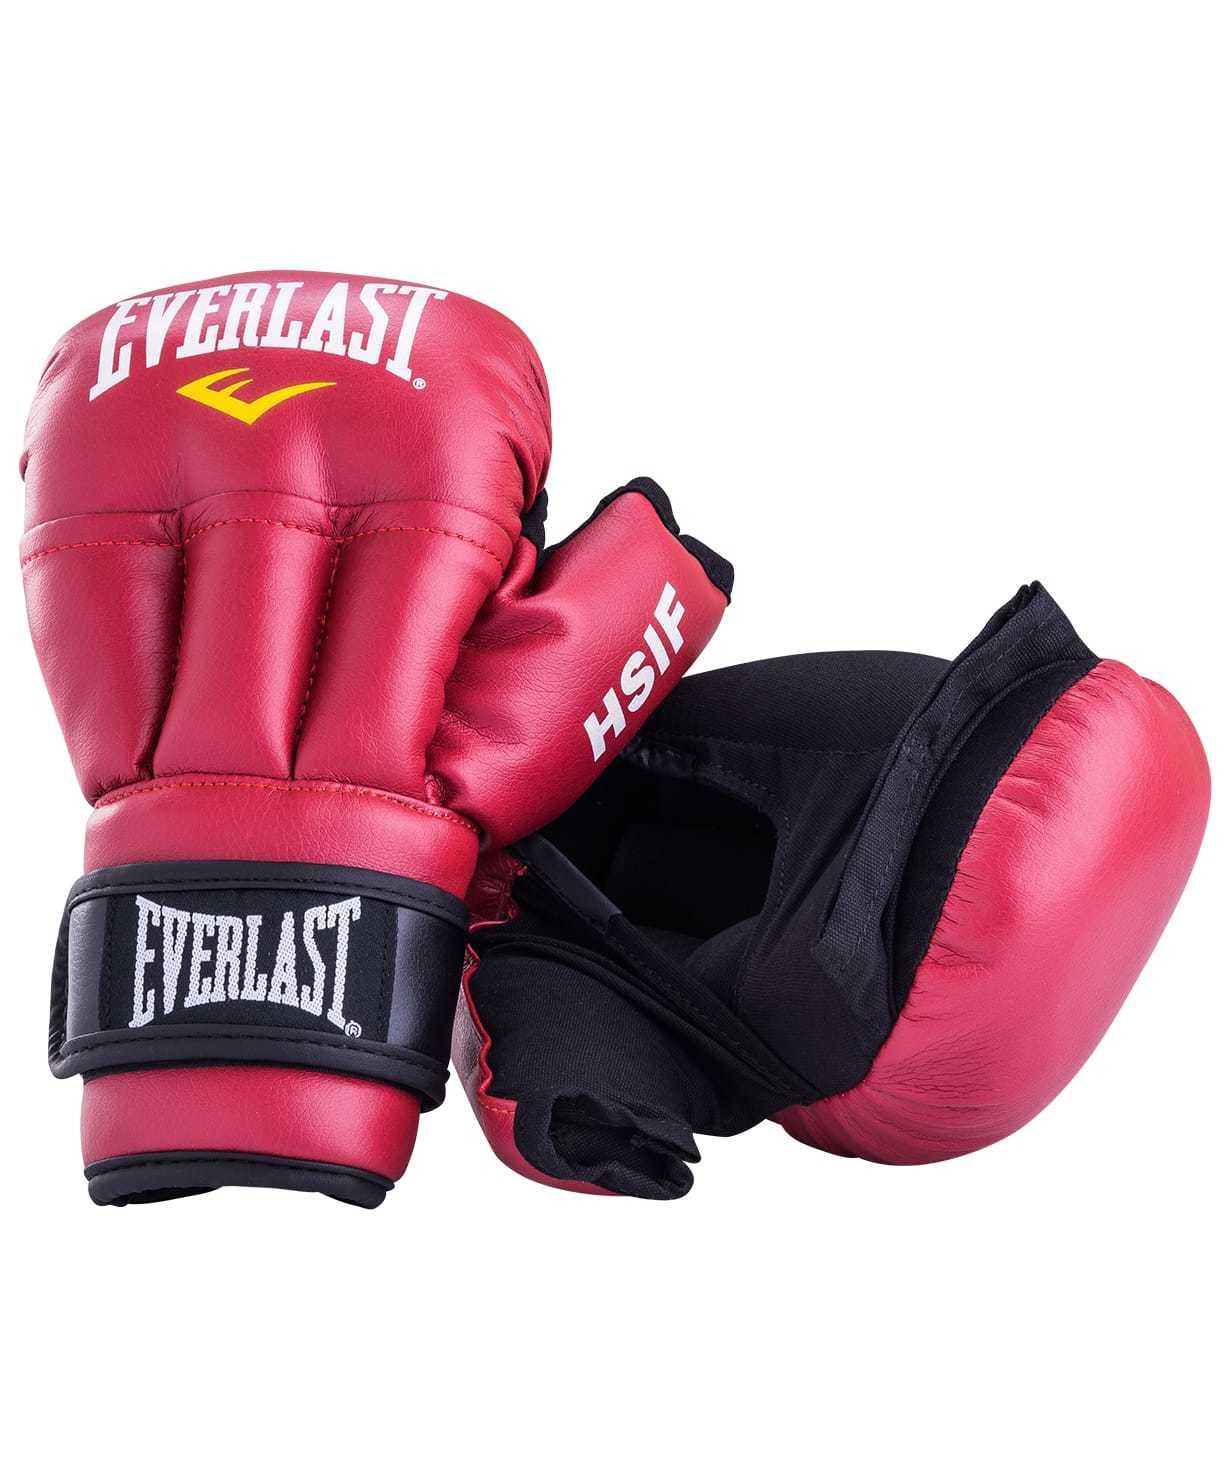 Перчатки Перчатки для рукопашного боя HSIF Everlast eb3d2e84f14286faf1c42a89d5ed2de7.jpg